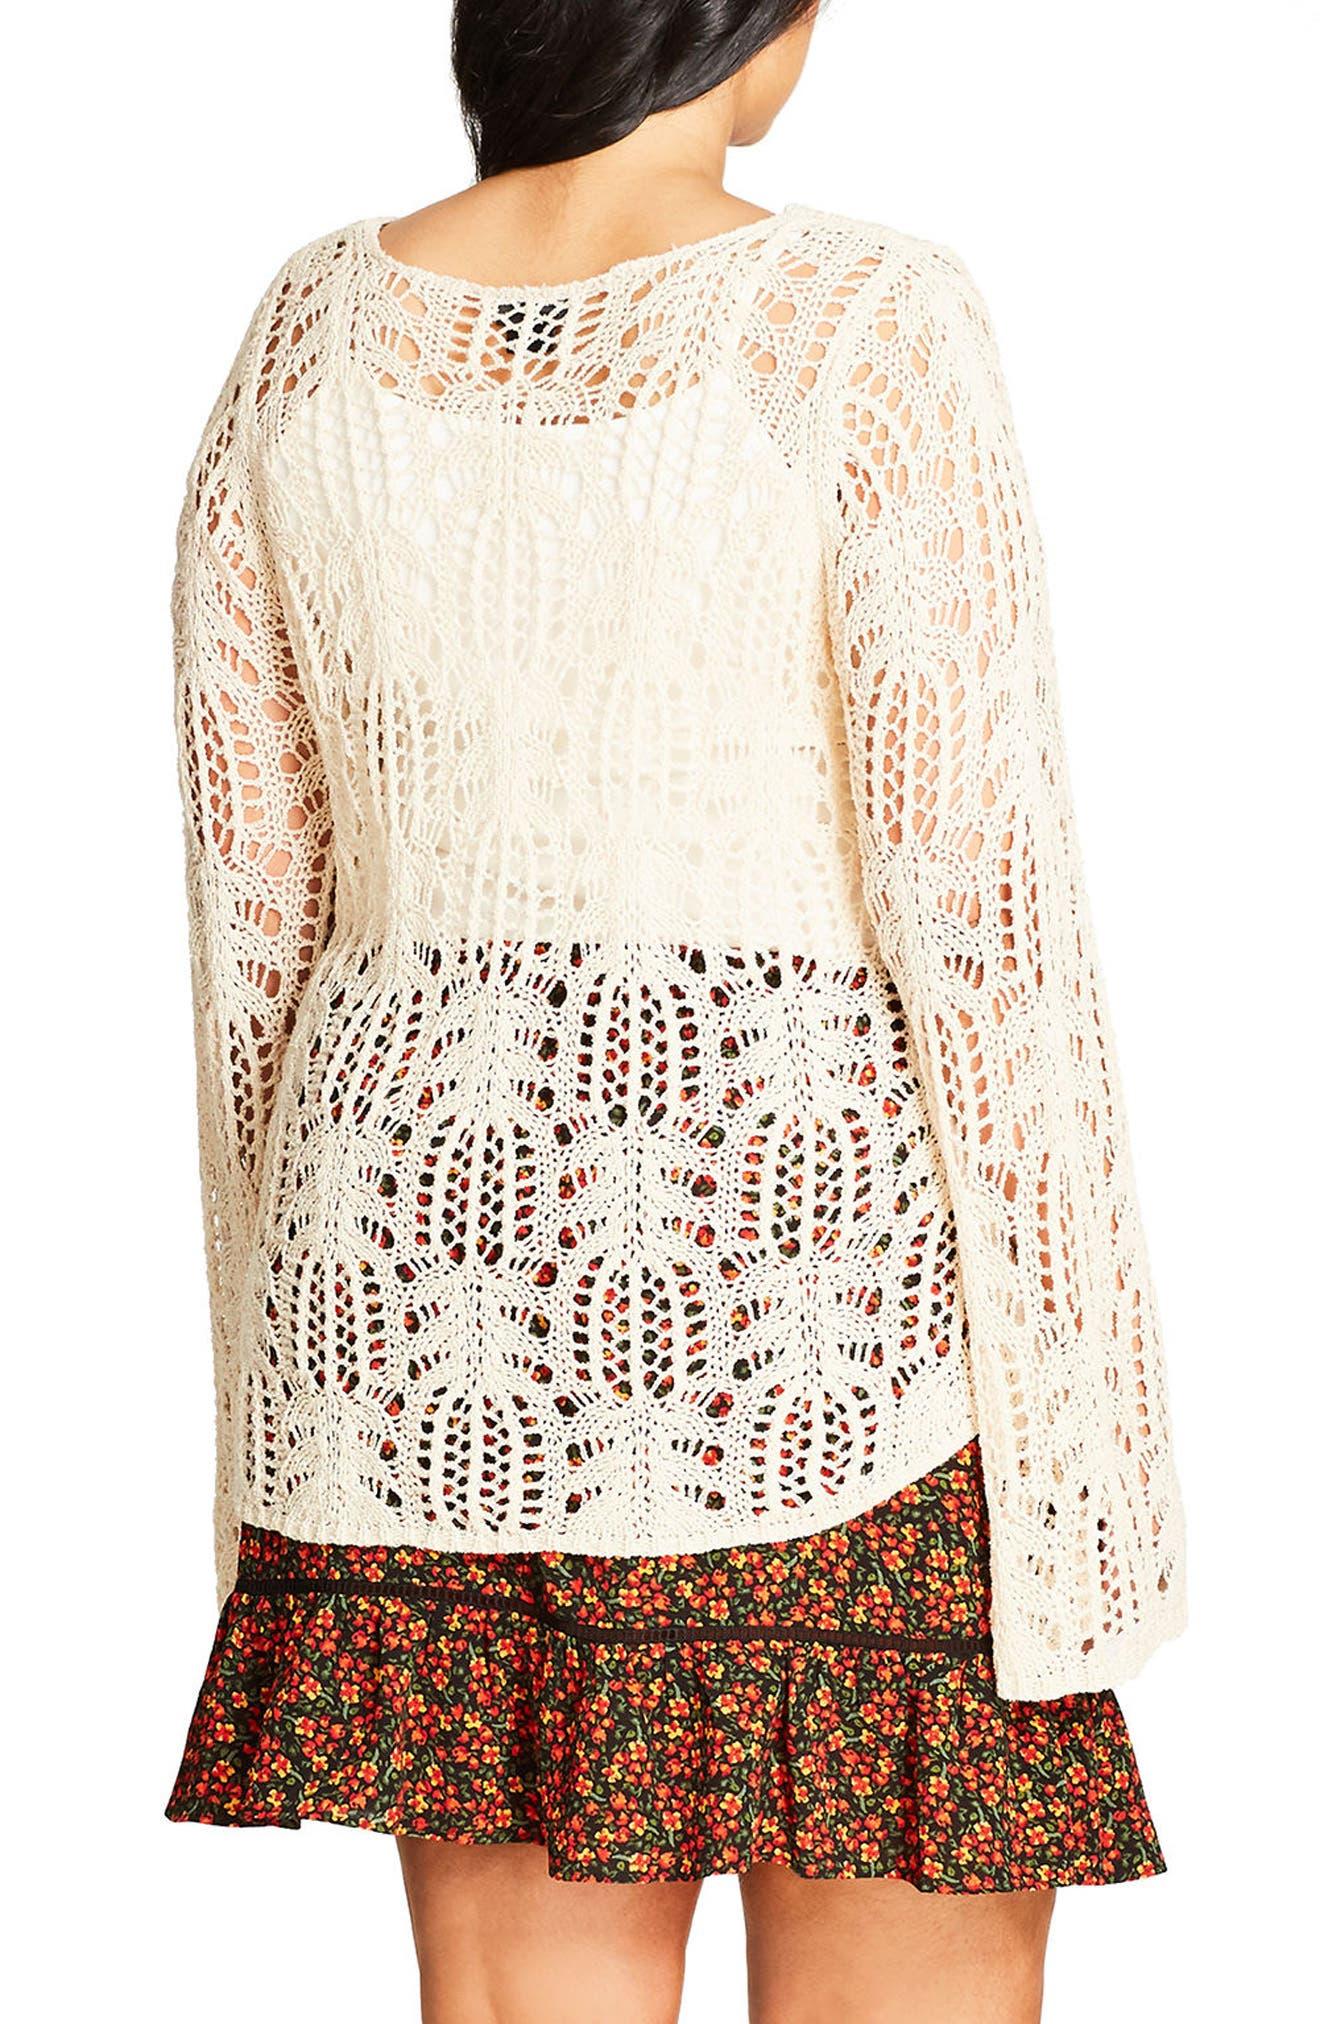 So Delicate Crochet Sweater,                             Alternate thumbnail 2, color,